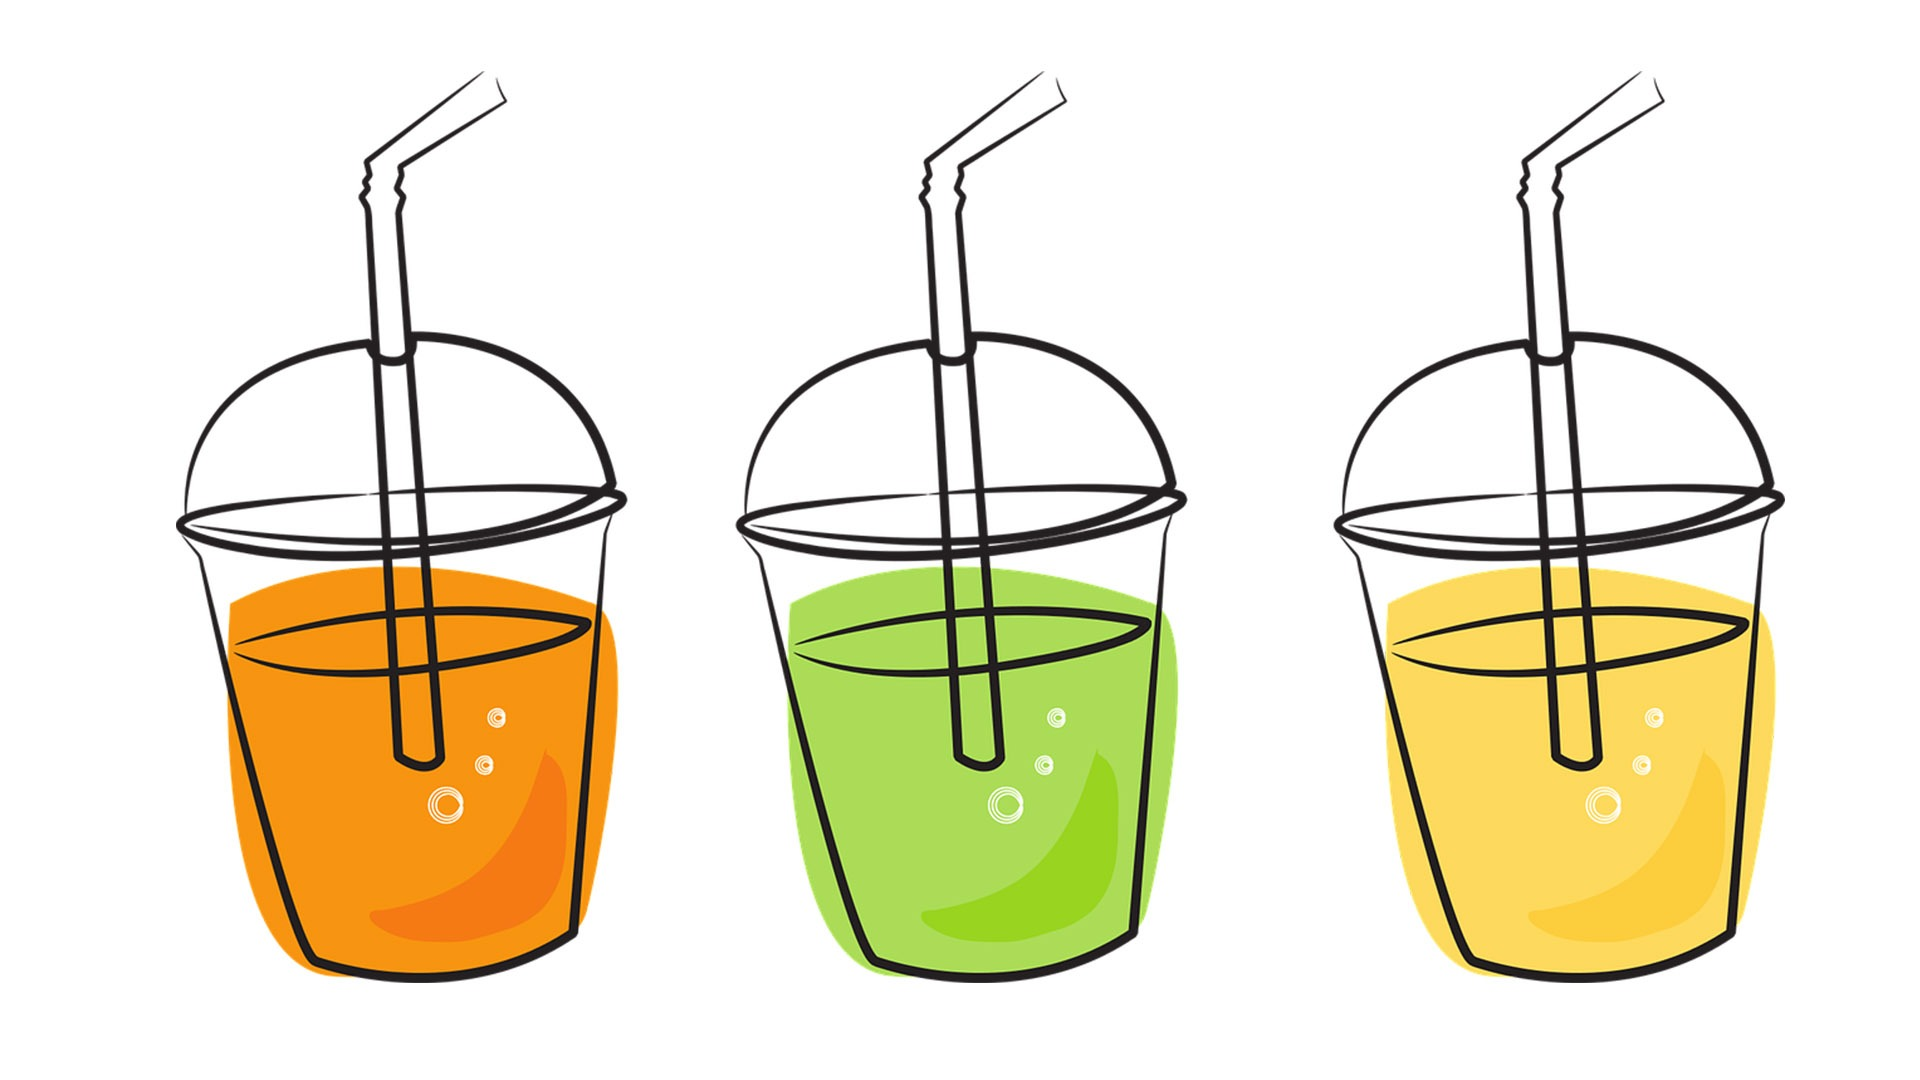 choisir jus de fruits industriel